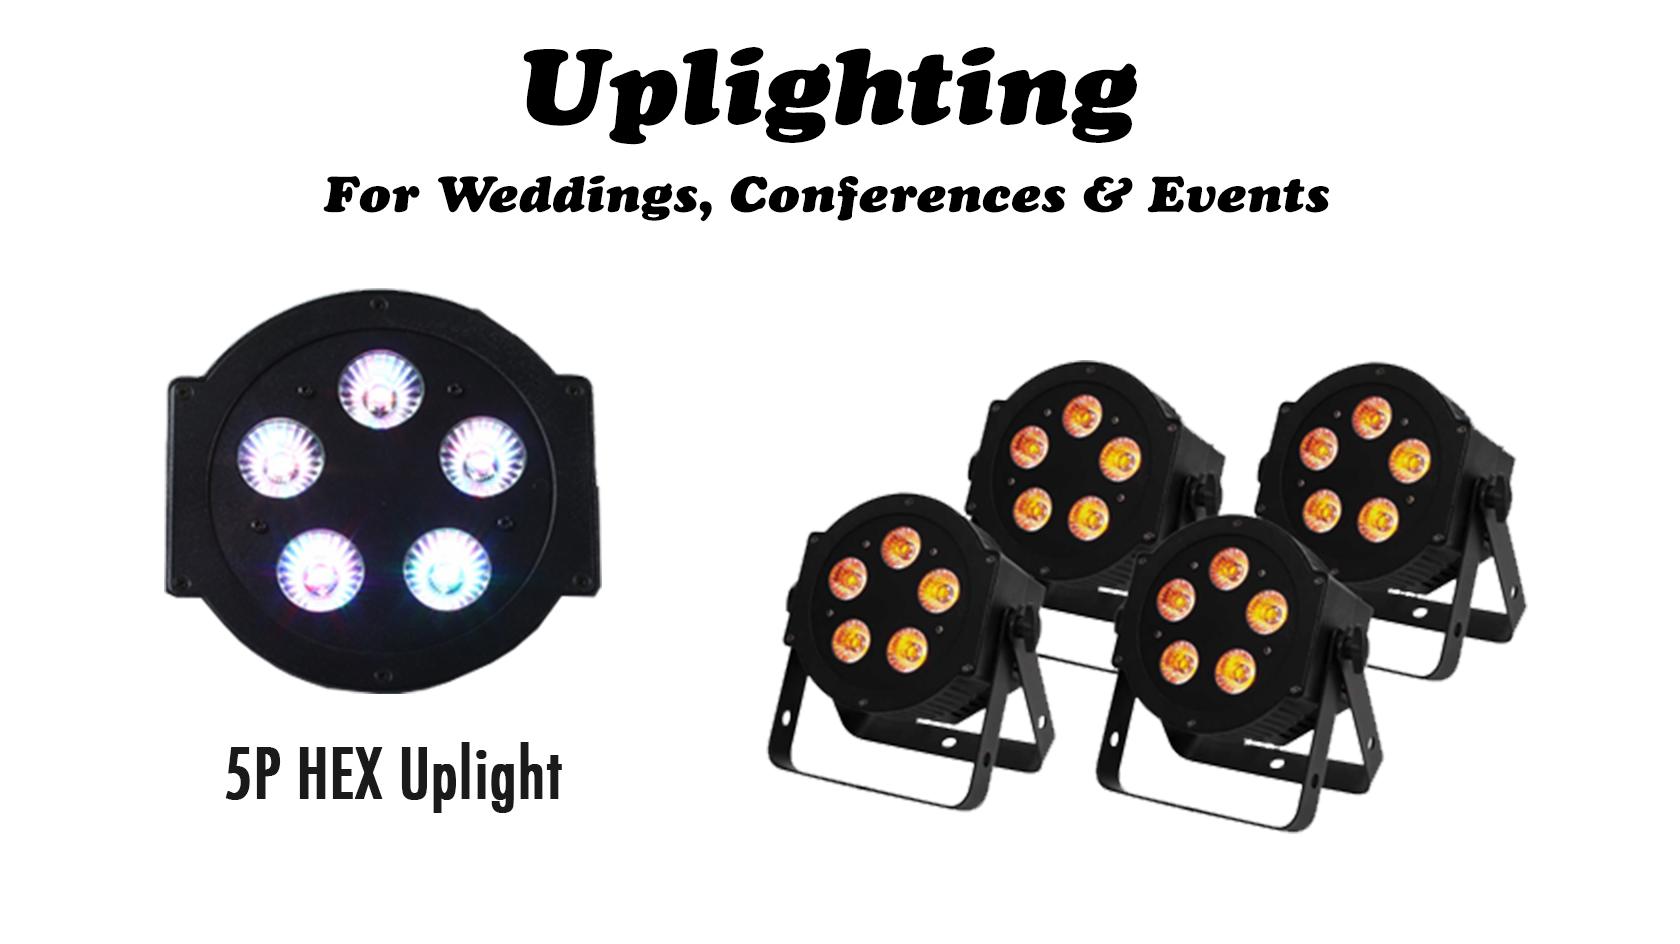 Rent Uplighting Lighting Event Packages Rock N Roll